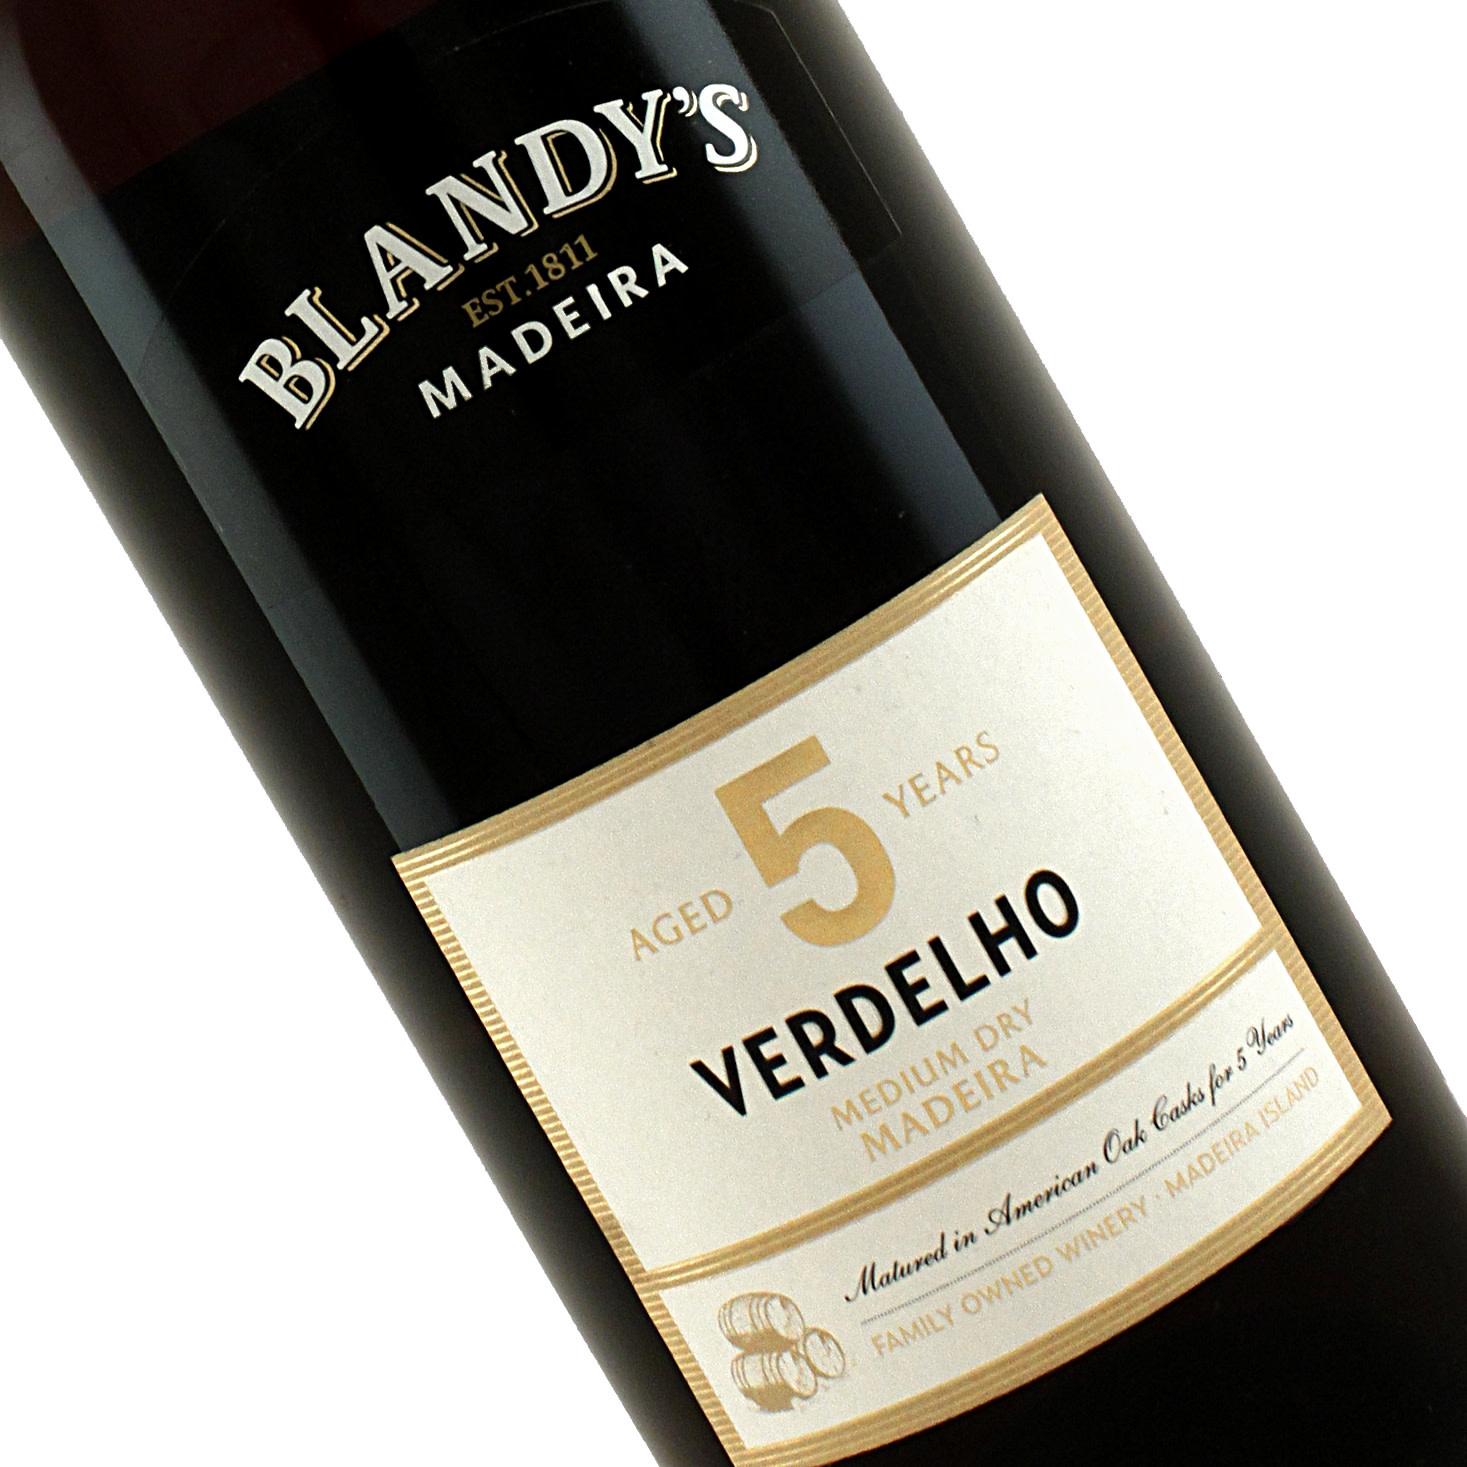 Blandy's 5 Year Old Verdelho Madeira, Portugal